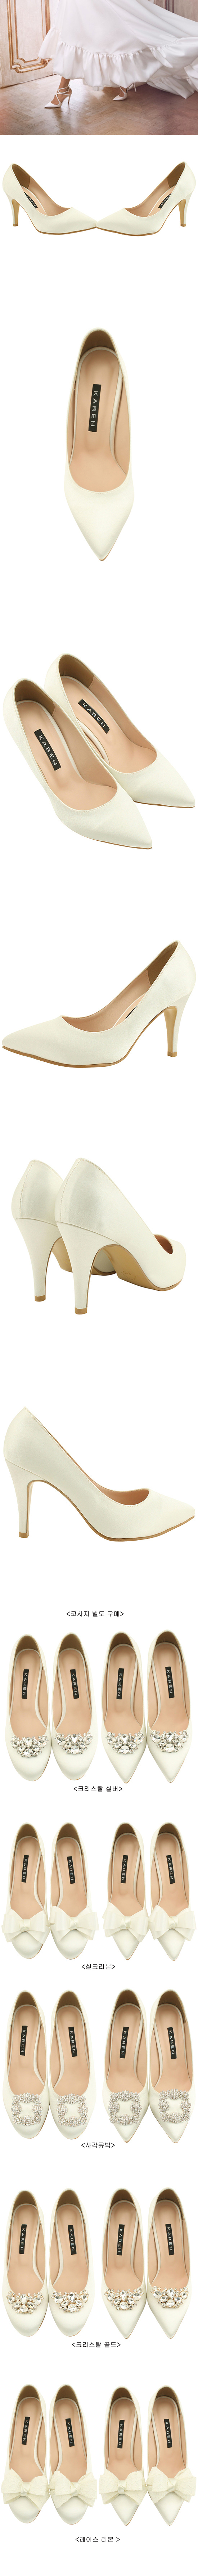 Wedding Shoes Stiletto High Heel Shoes 9cm